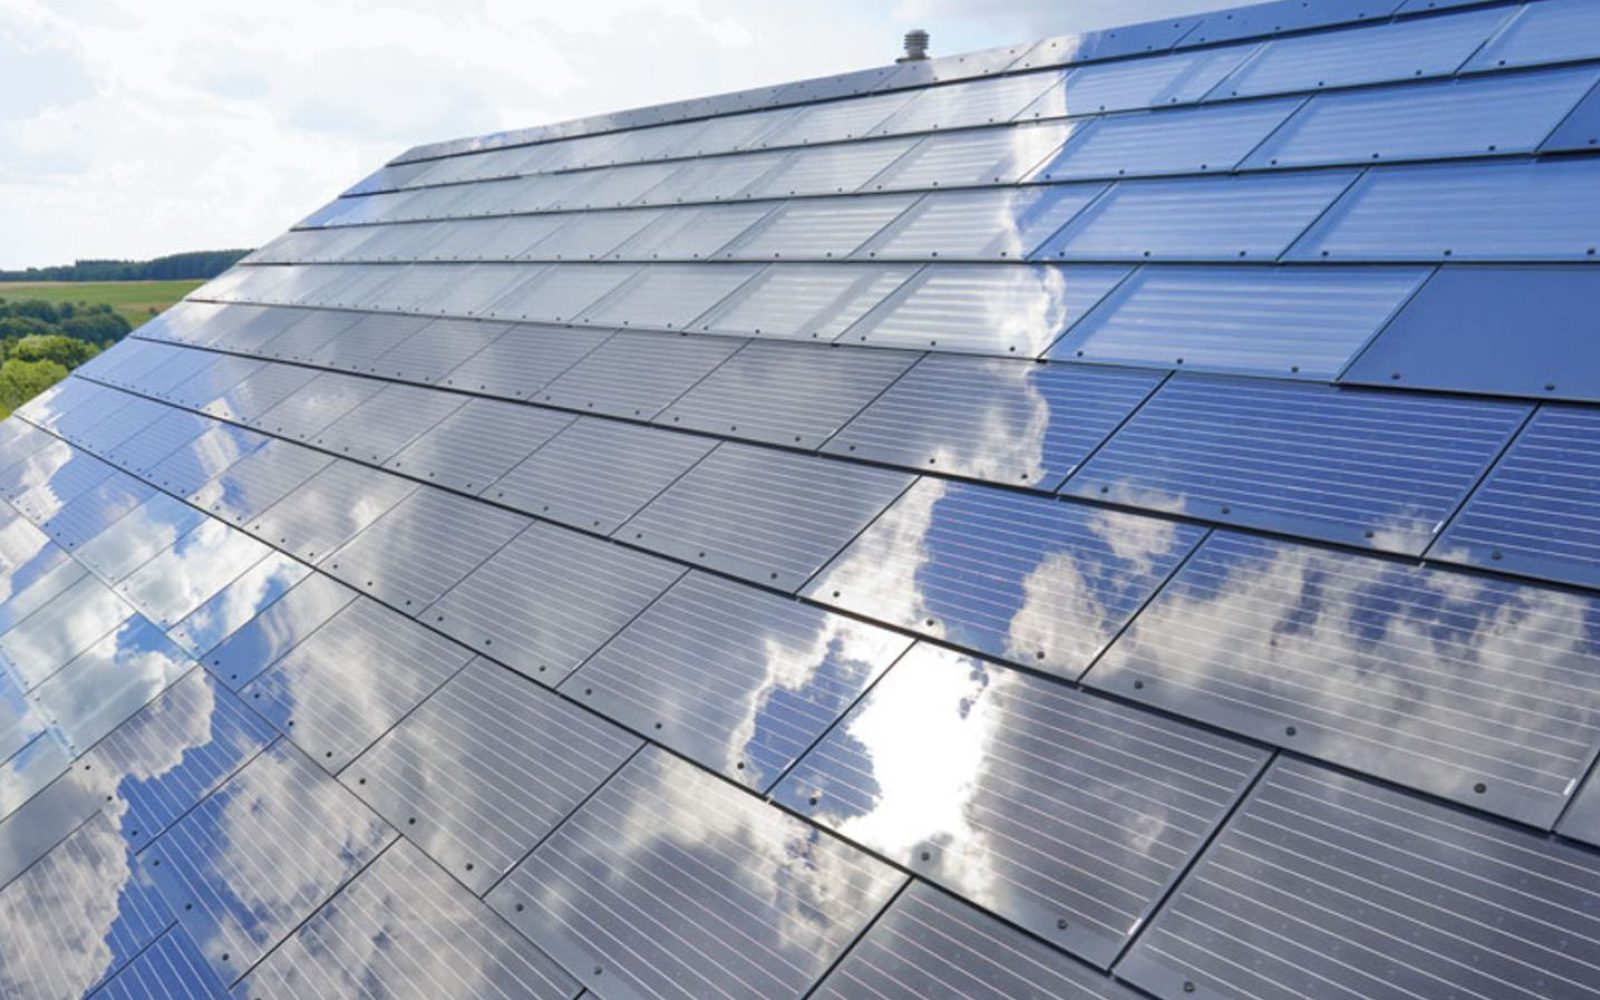 solar-shingles-e1470789579882.jpg